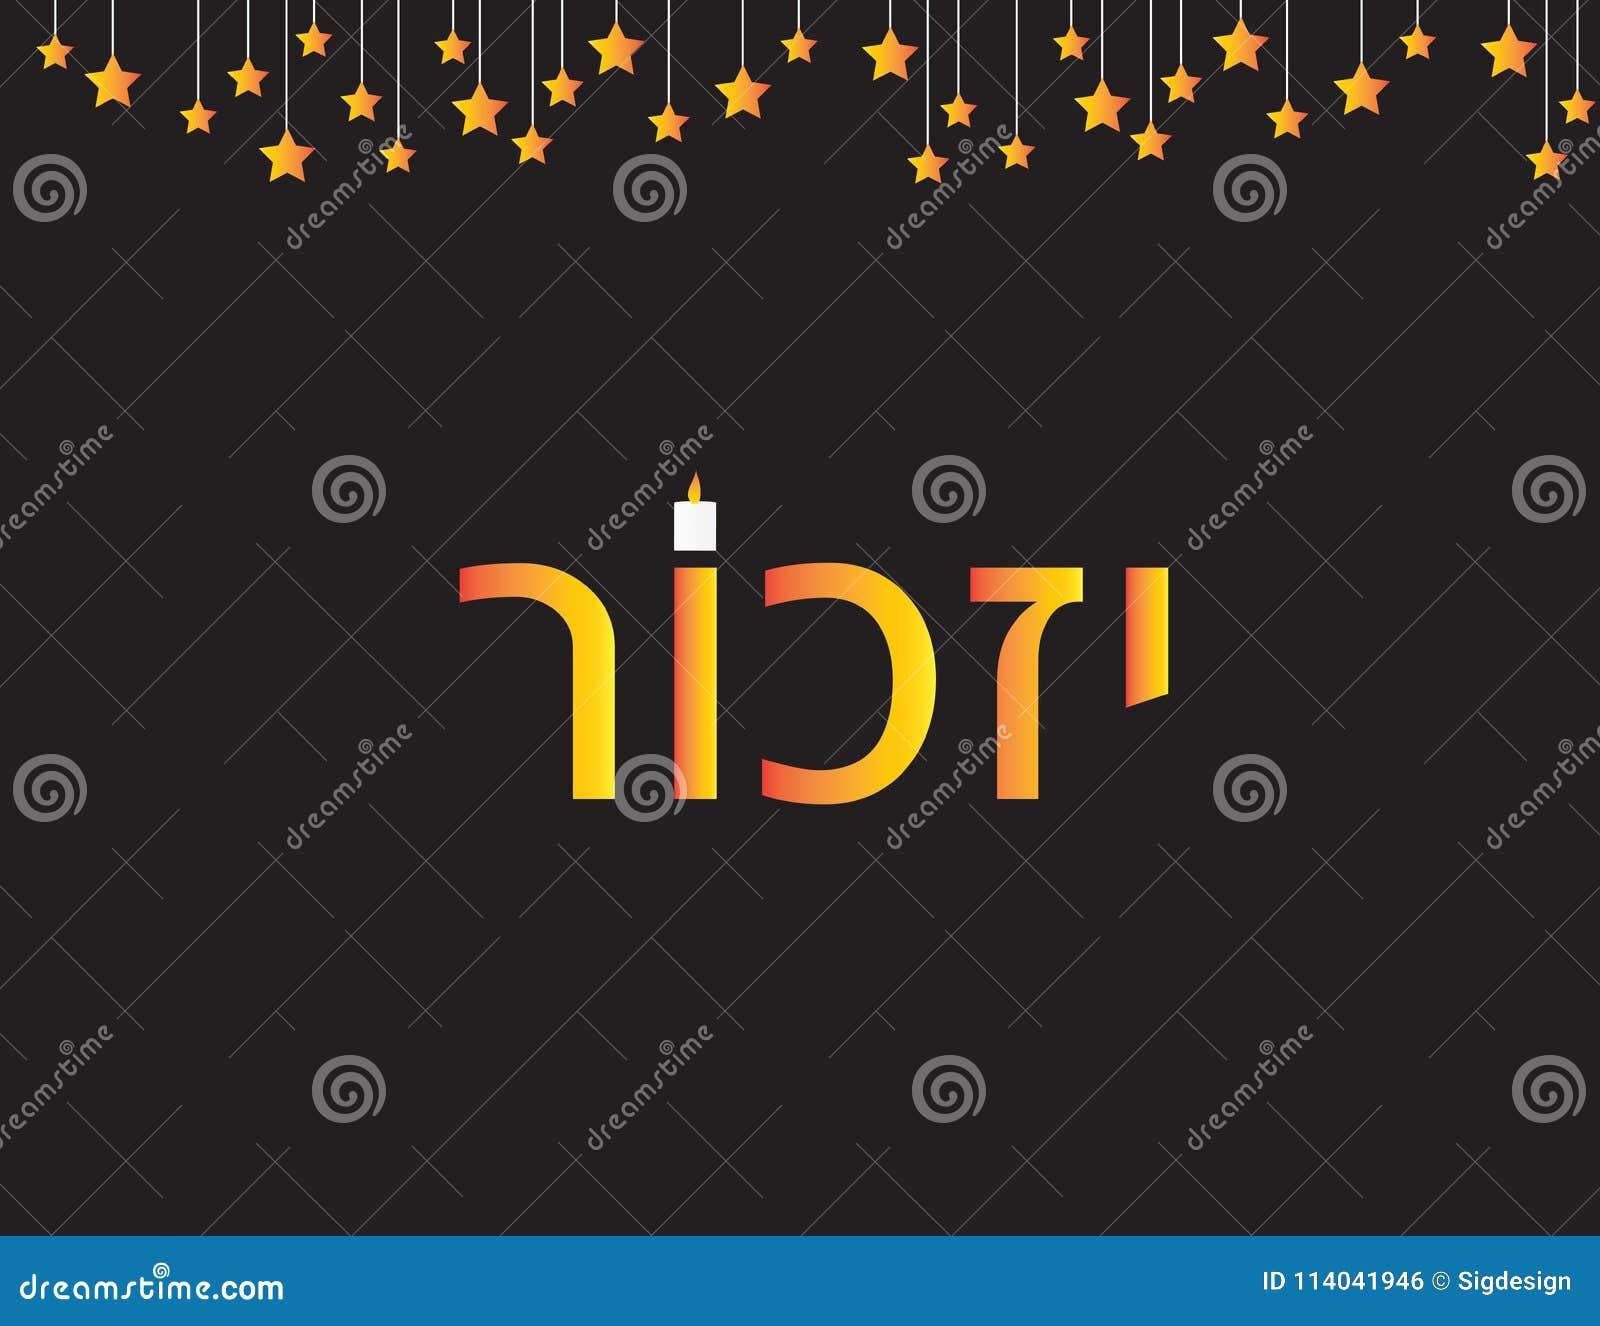 Bandeira do Memorial Day de Israel Texto hebreu IZKOR e estrelas no fundo preto